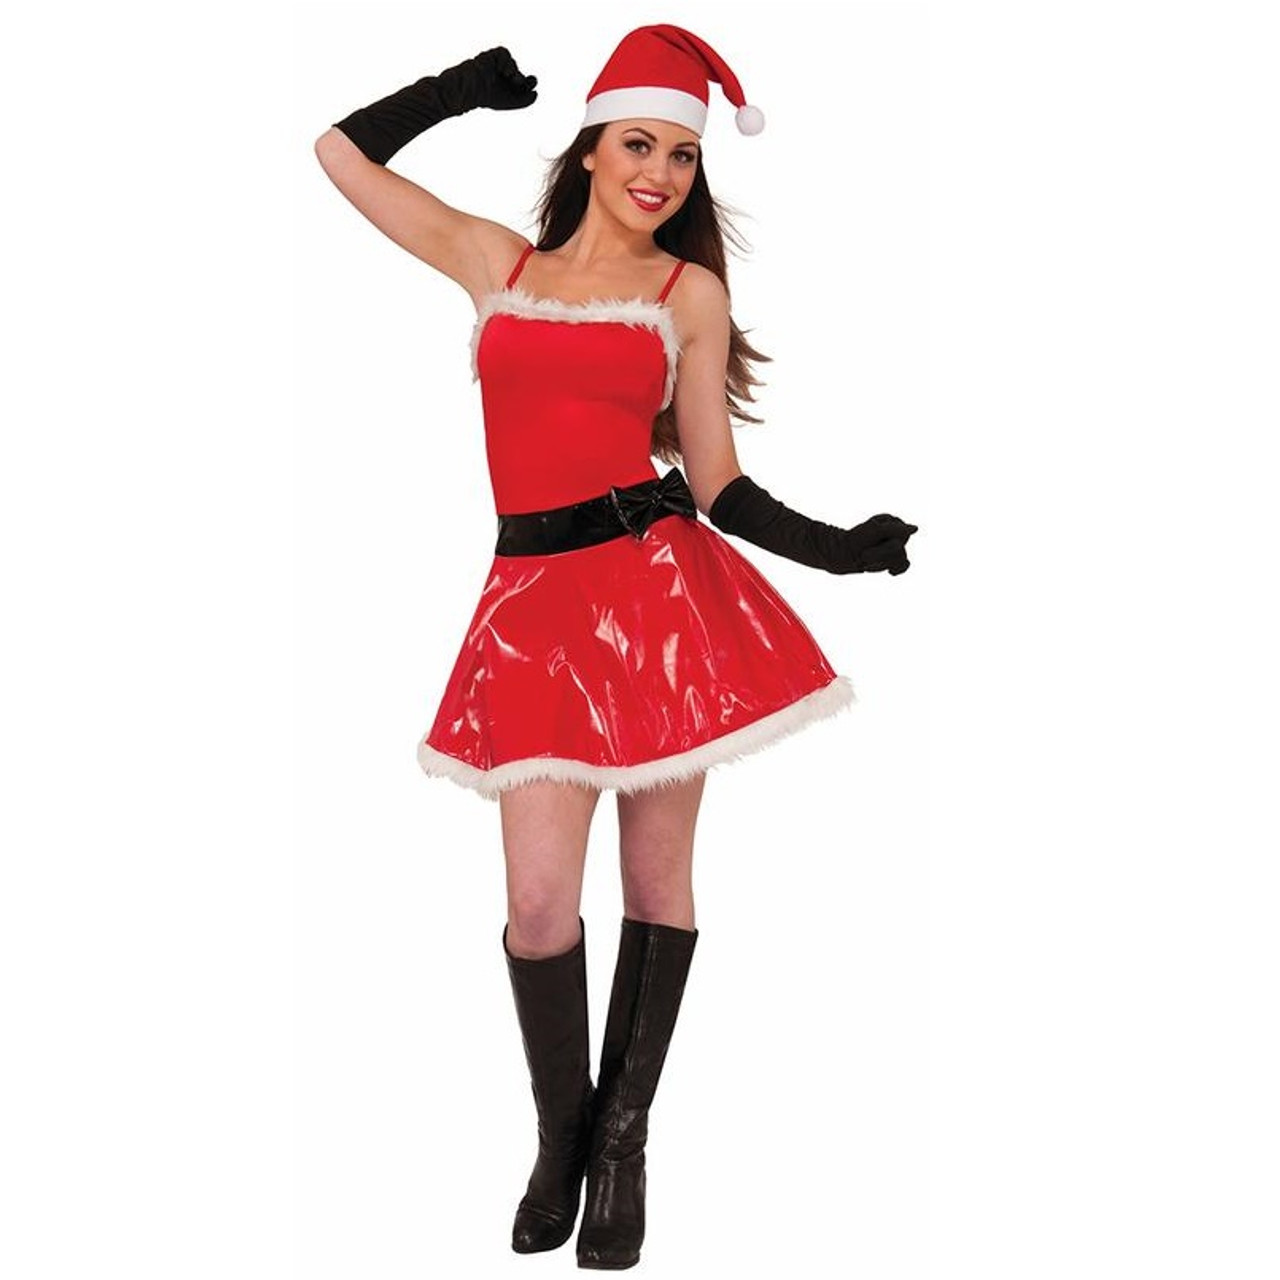 377aad2956d Sexy Santa Costume - Mean Girls Movie - RetroFestive.ca